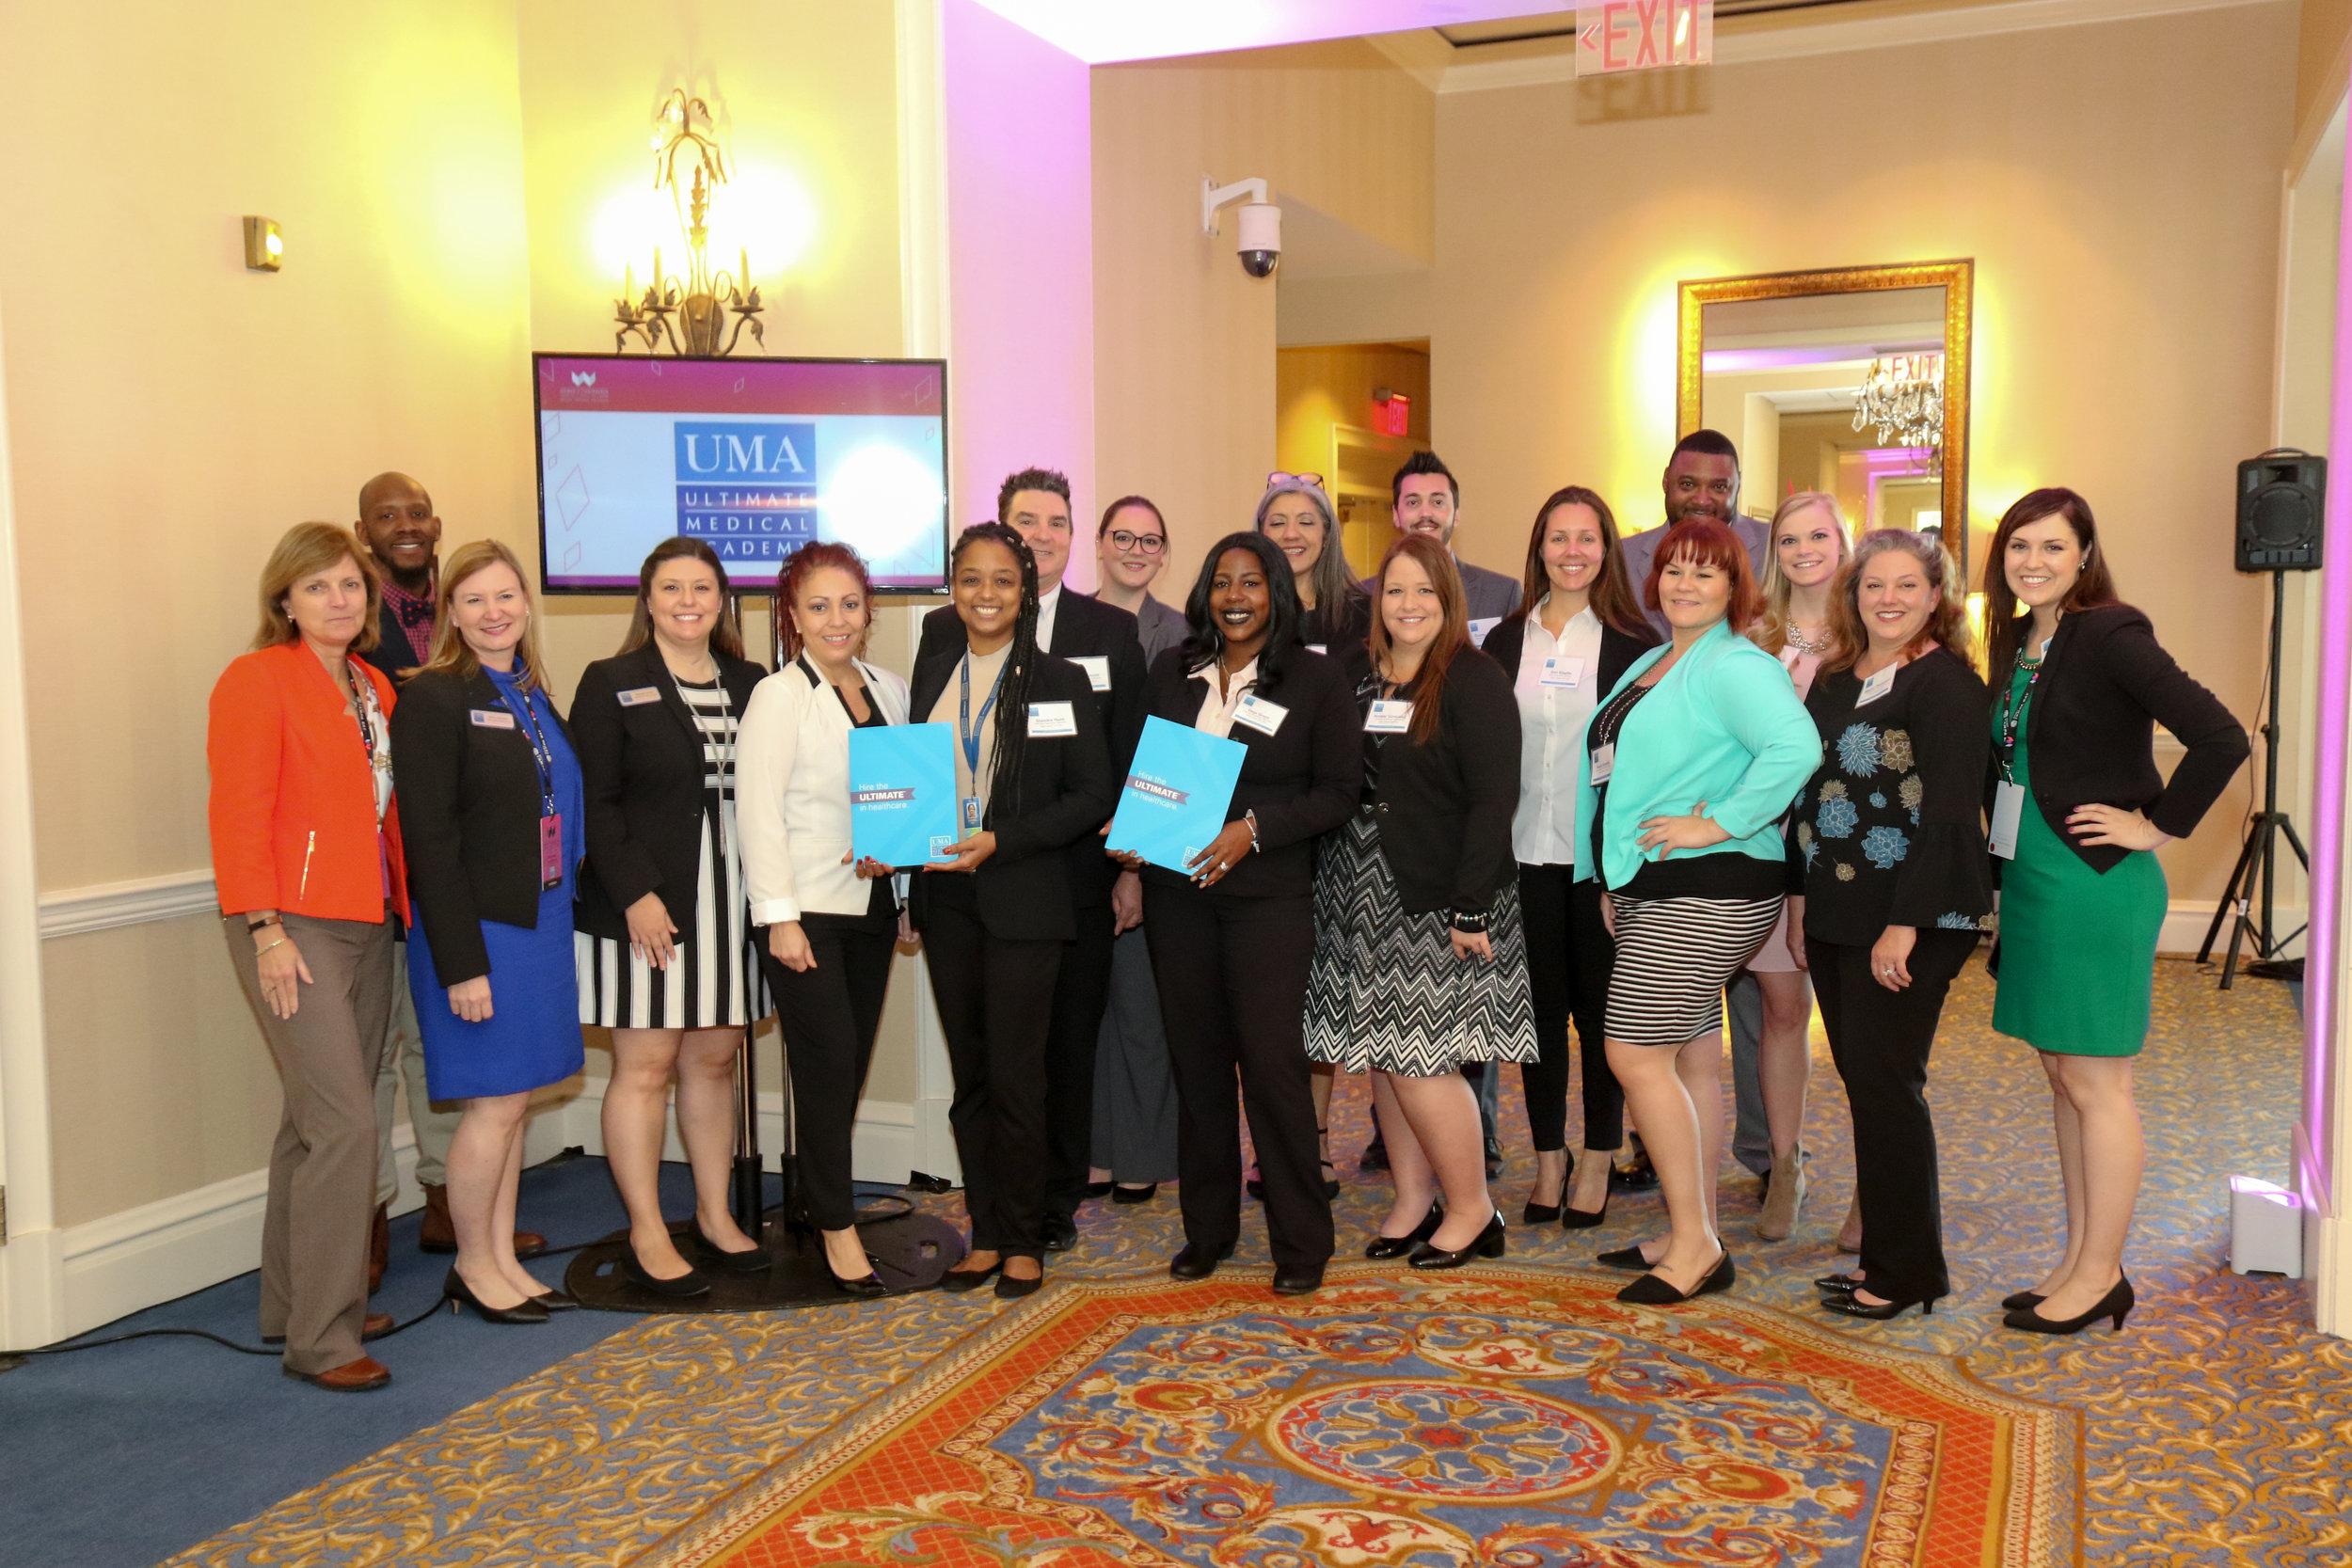 179_WomensConference_10-26-17.jpg